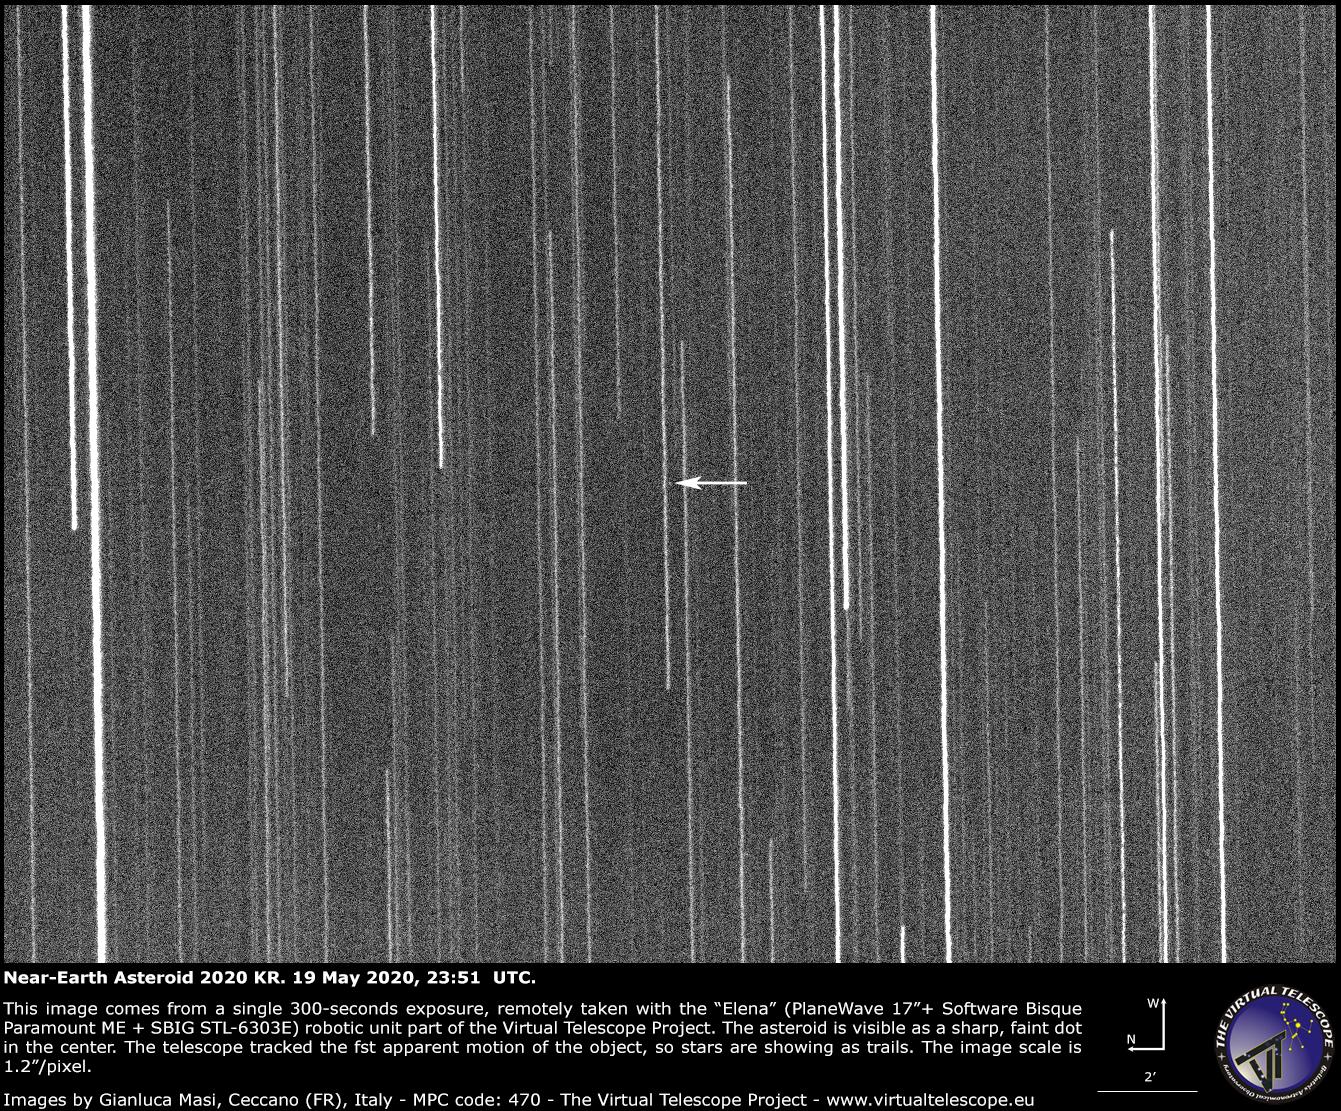 Near-Earth Asteroid 2020 KR - 19 May 2020.